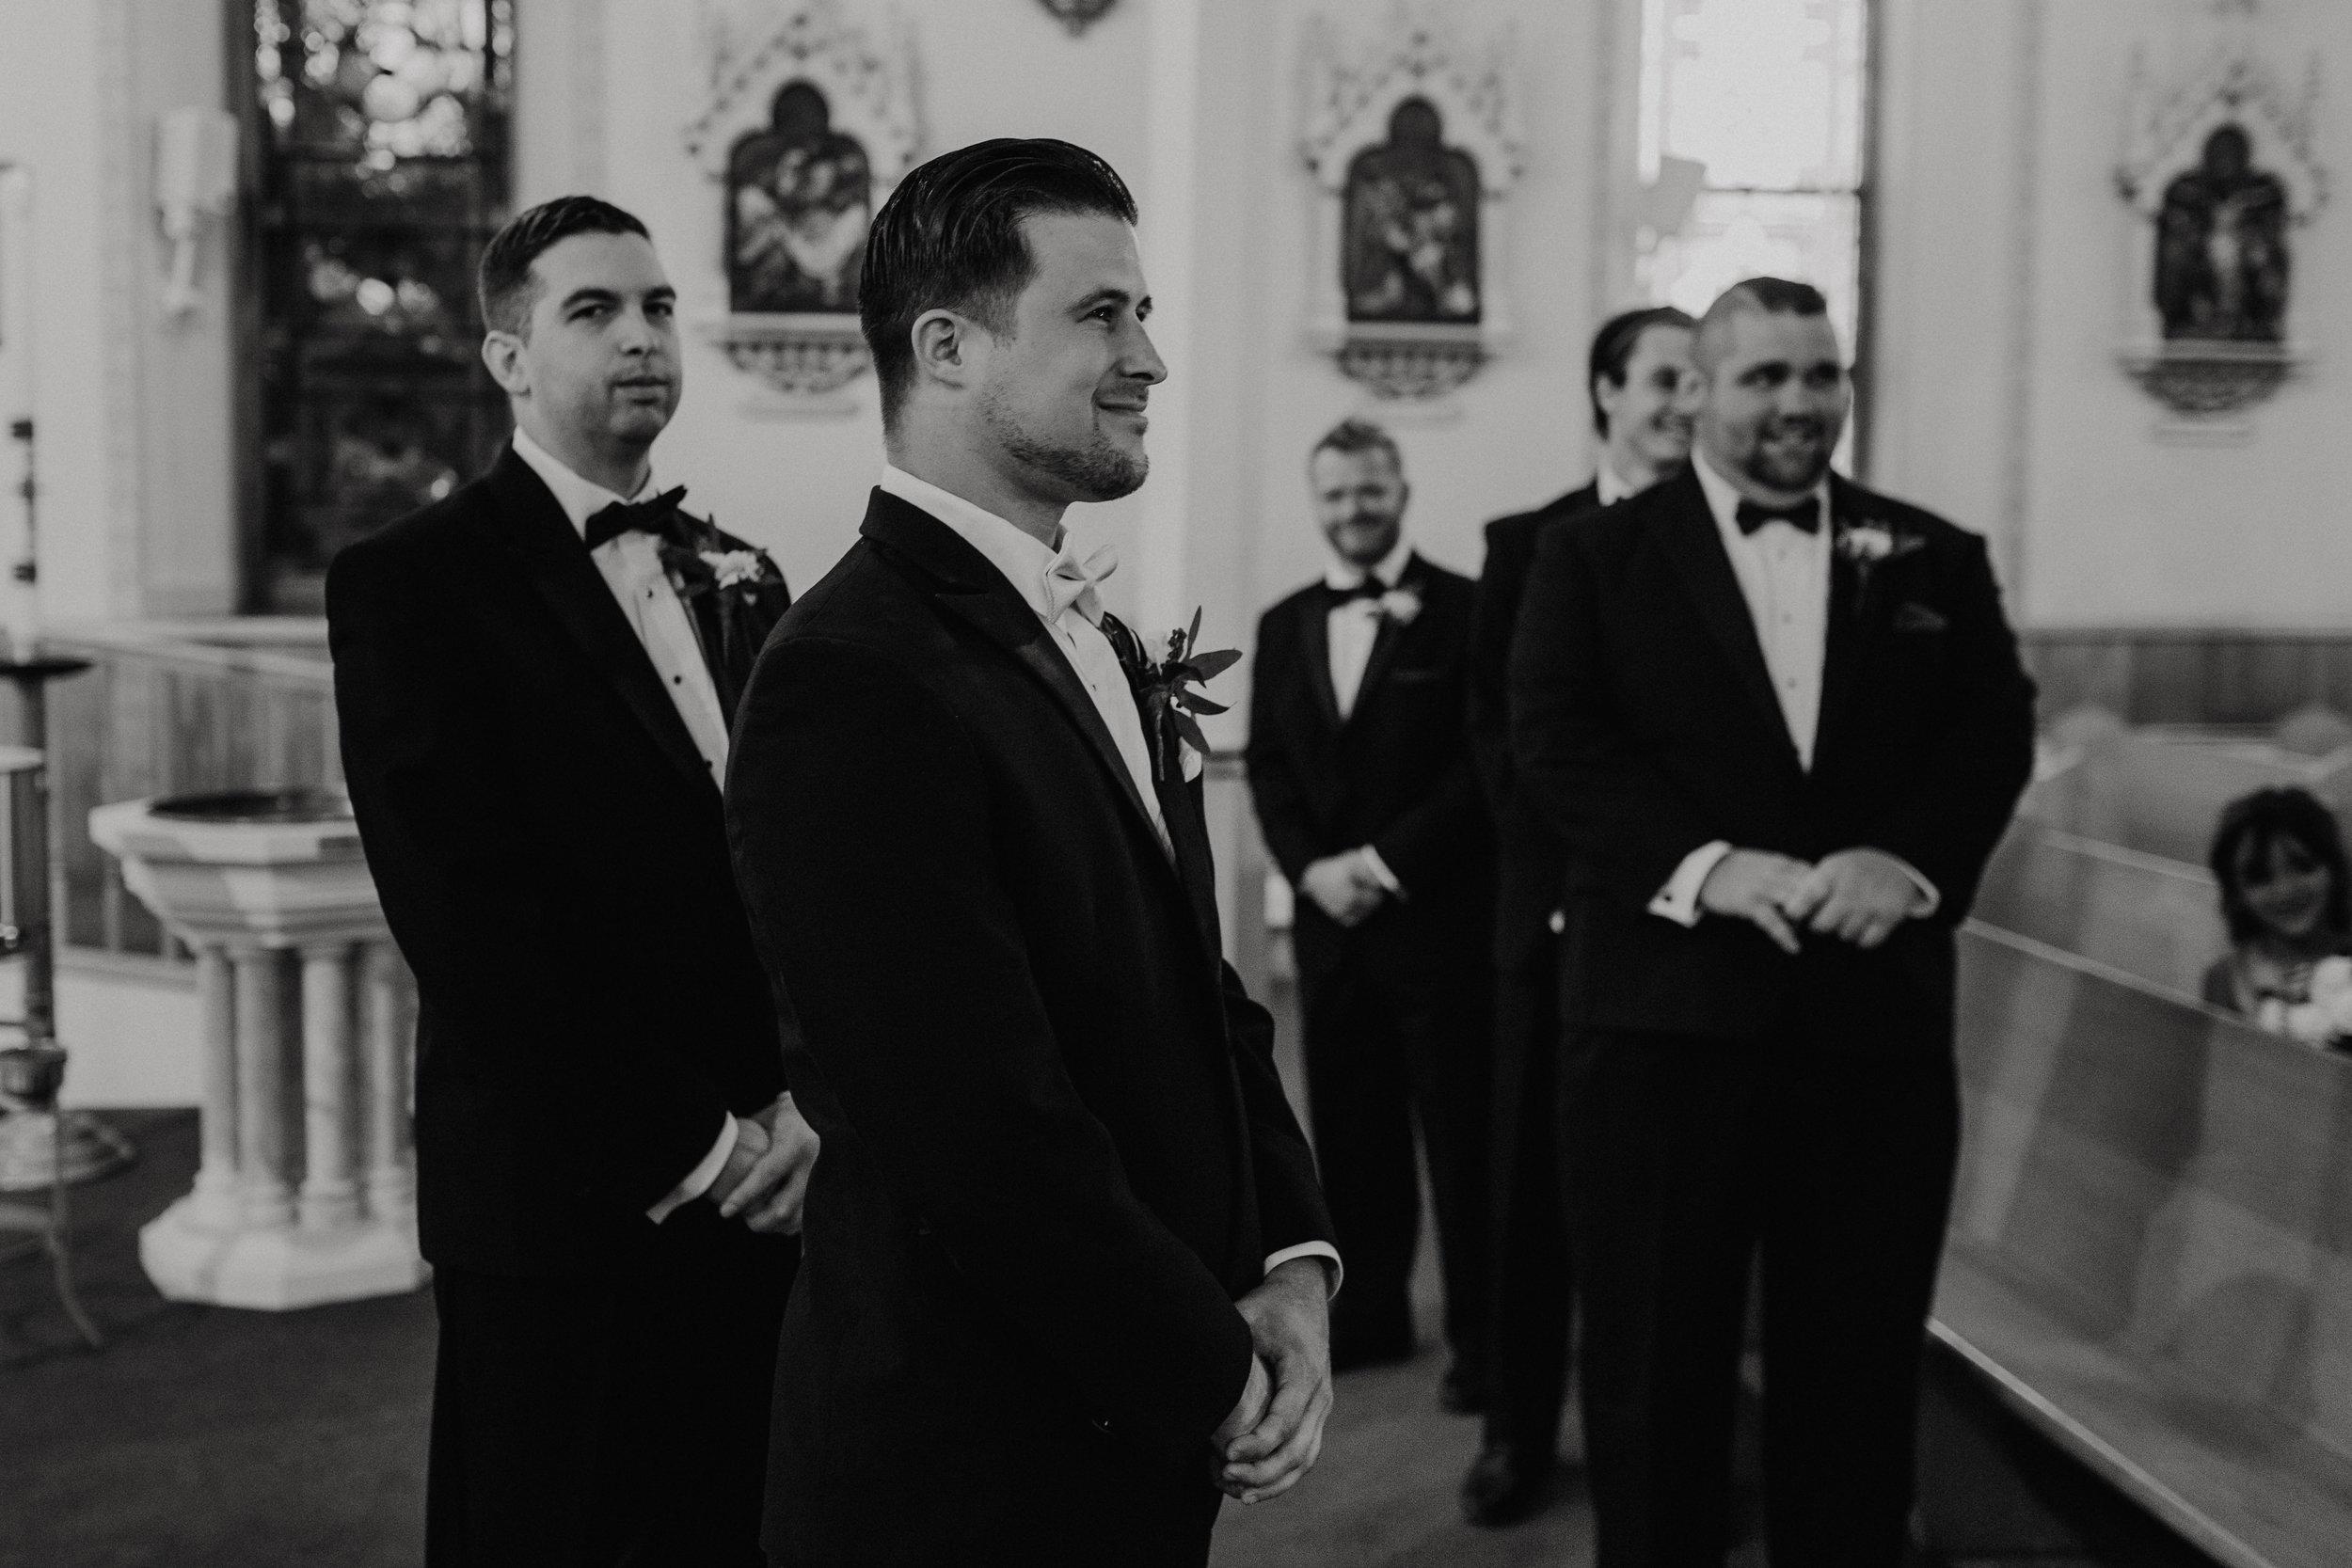 upstate_ny_wedding-23.jpg